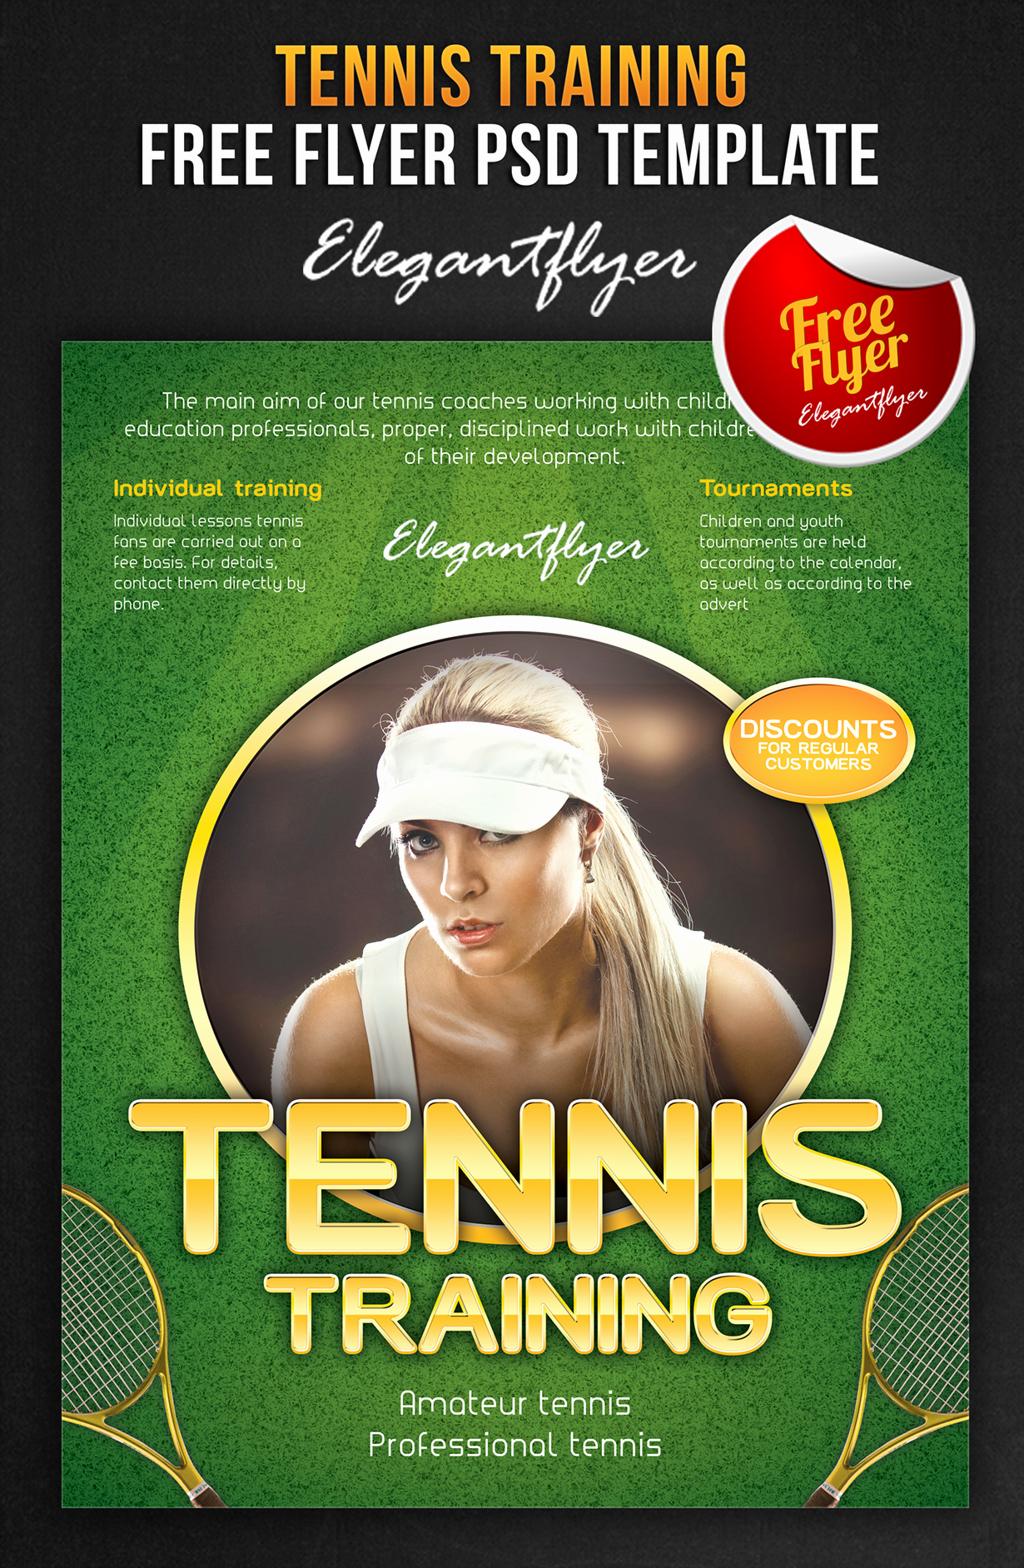 Tennis Flyer Template Free Beautiful Tennis Flyer Template Free Yourweek Aeca25e